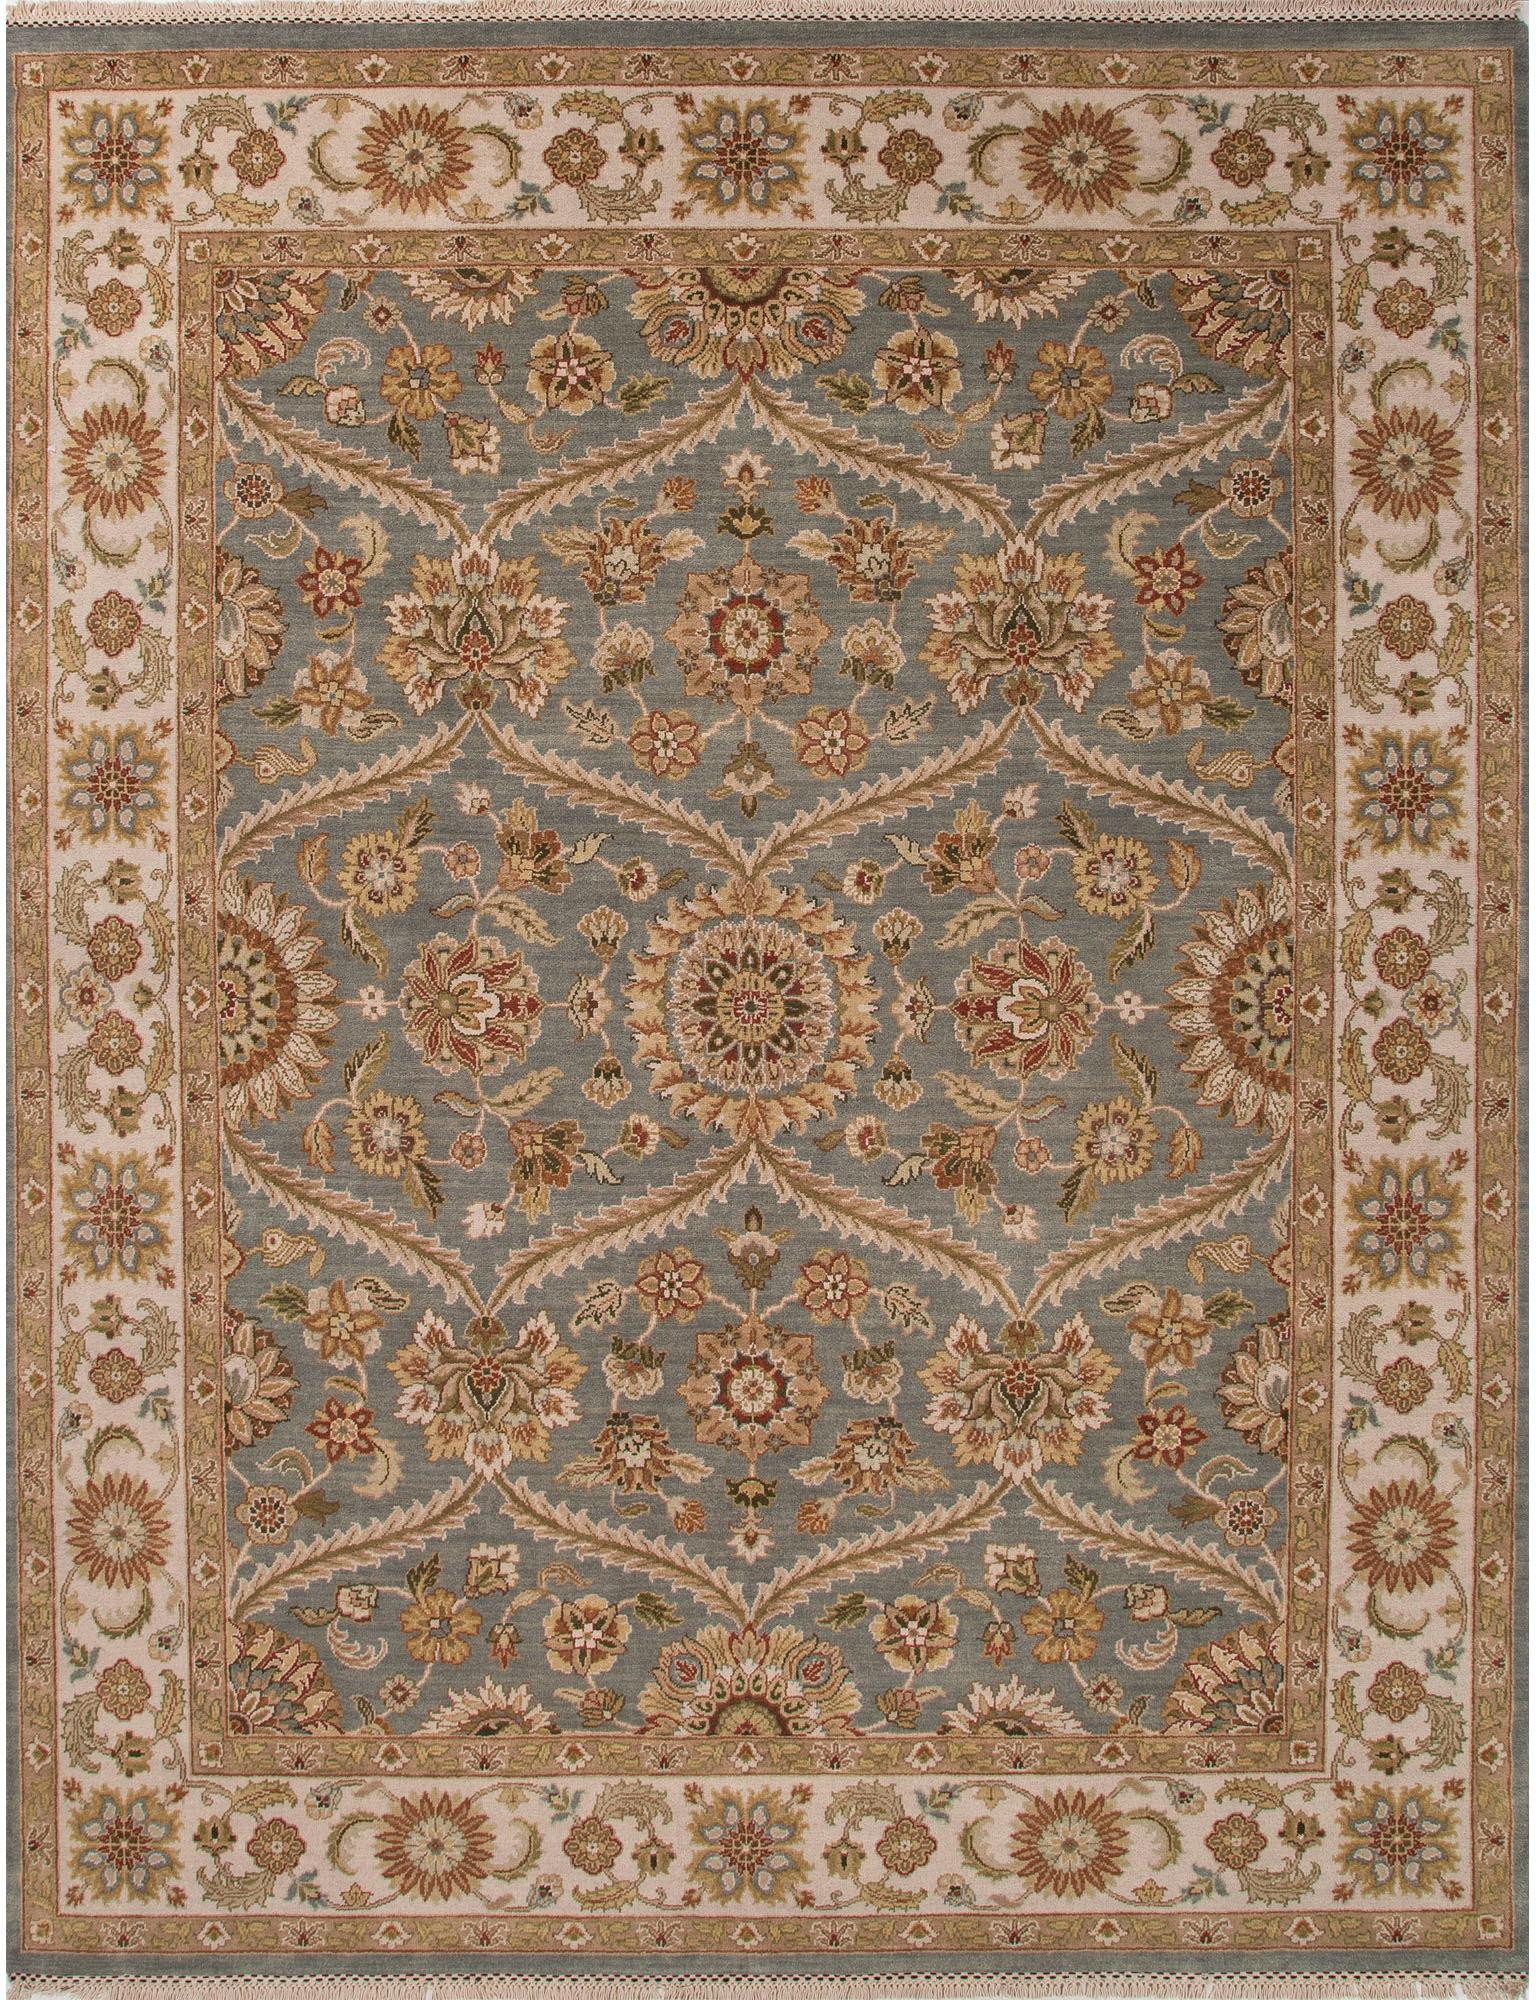 Jaipur Rugs Floor Coverings Jaipur Hand Knotted Oriental Pattern Blue Ivory Amp White Wool Area